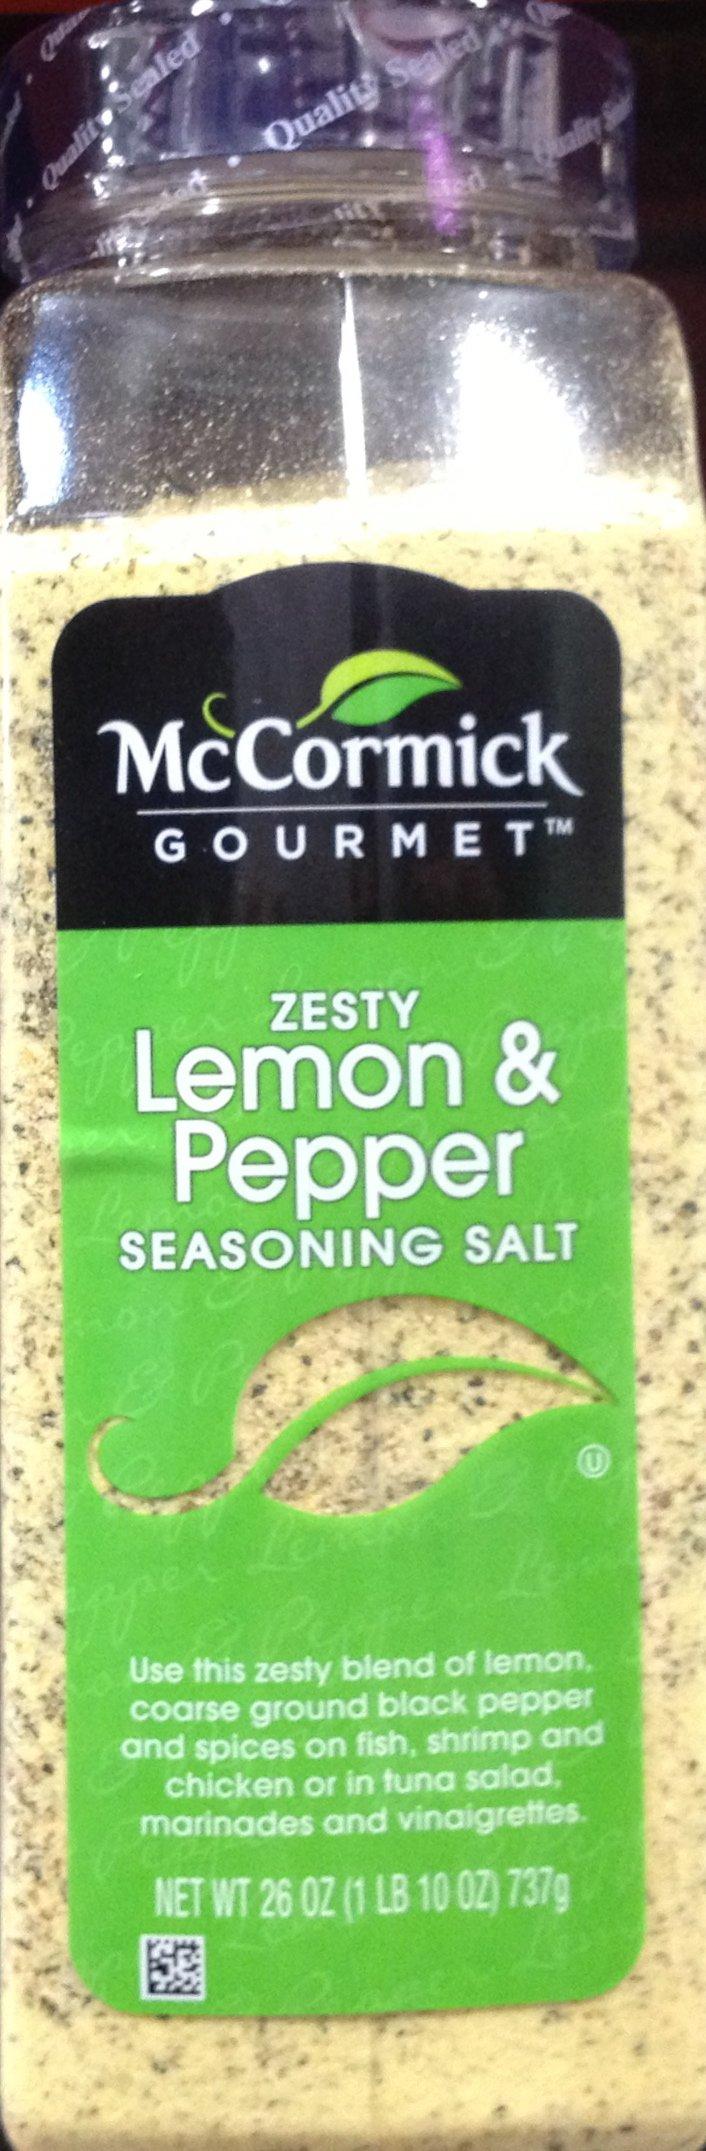 McCormick's Gourmet ZESTY LEMON & PEPPER Seasoning Salt 26oz (3 Pack)